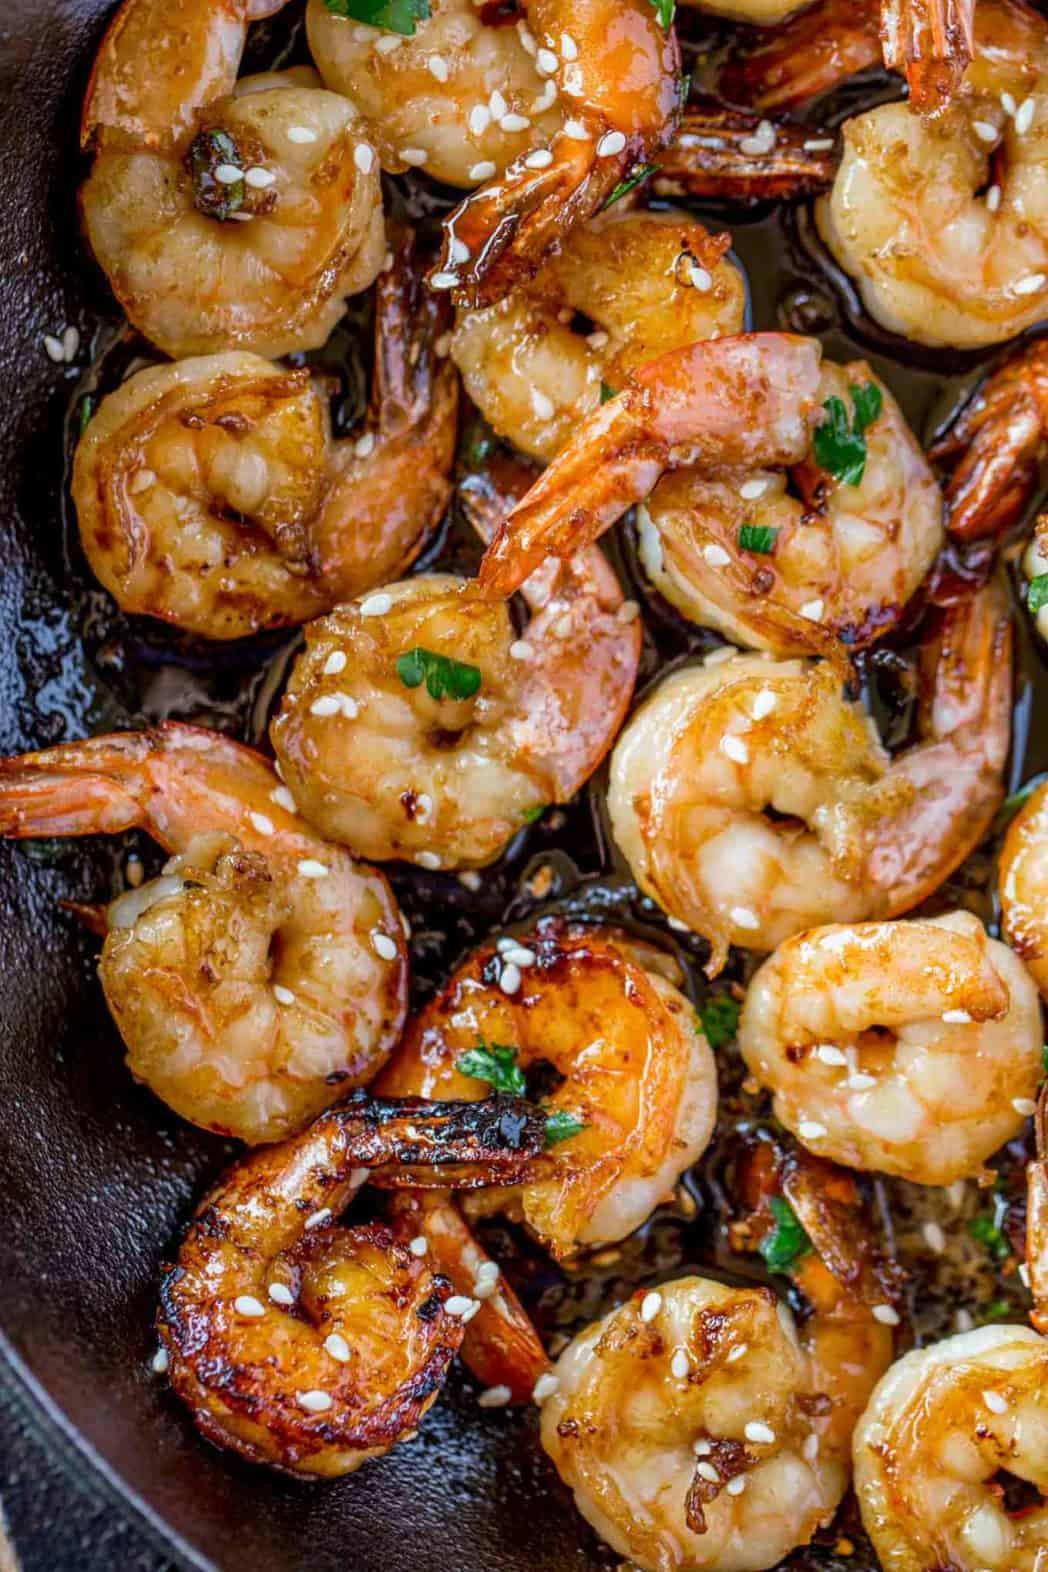 Side Dishes For Seafood  Easy Honey Garlic Shrimp Dinner then Dessert